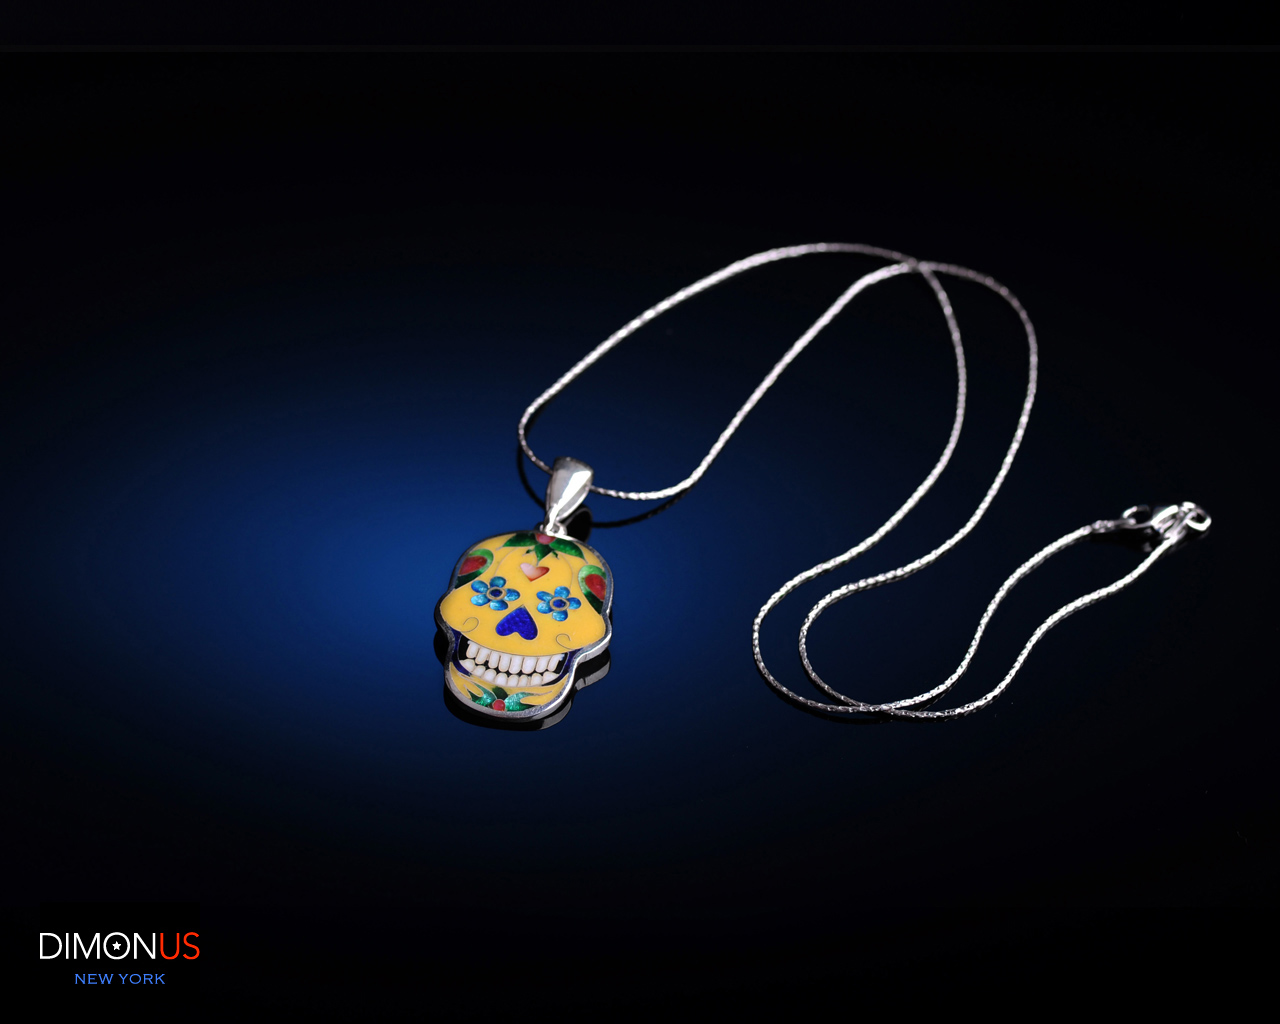 Jewelry design for Dimonus Dmitriy Polyakovs Design Portfolio